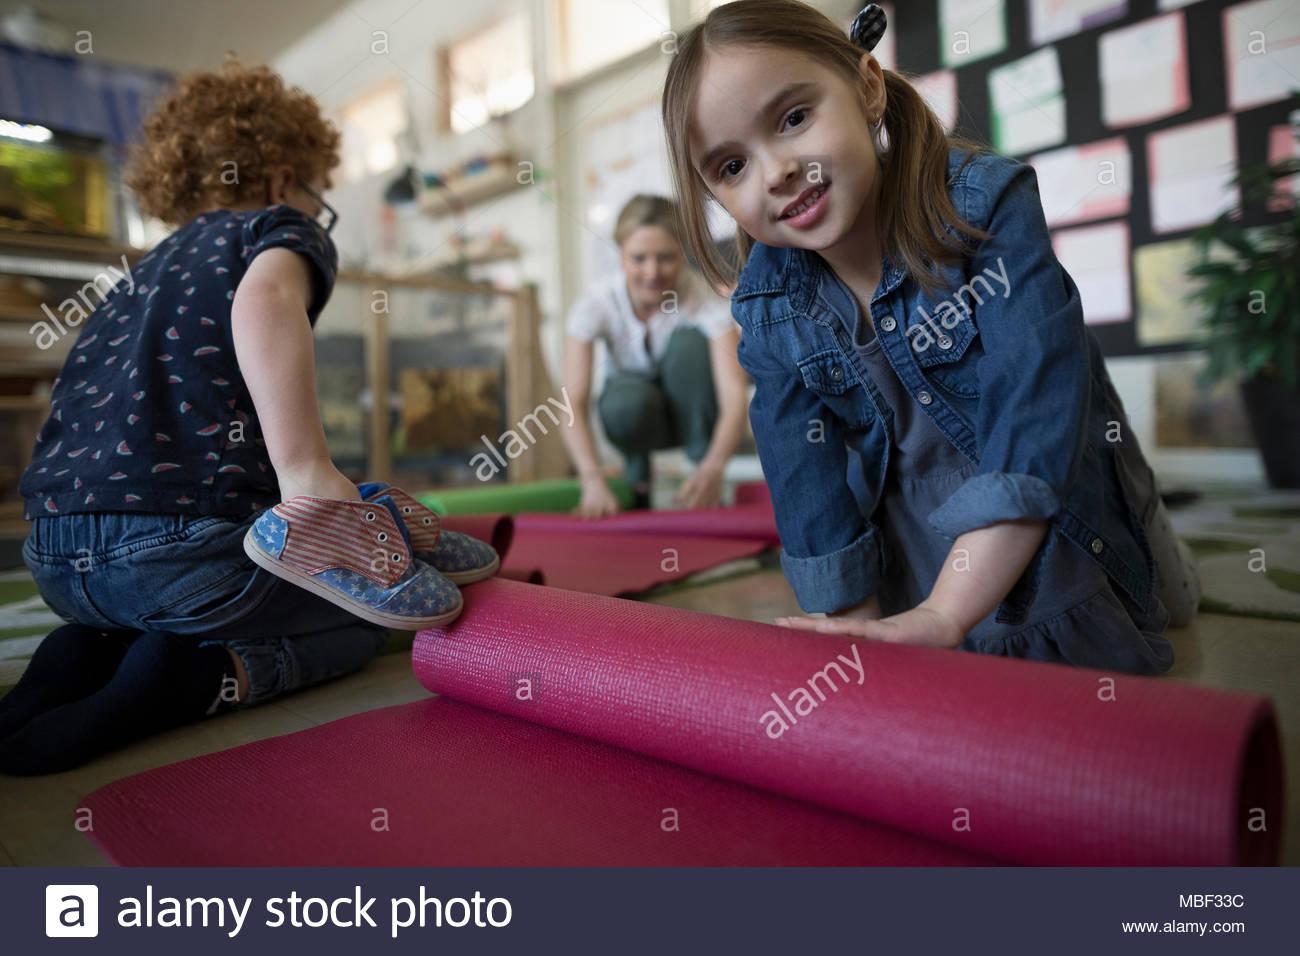 Portrait confiant preschool girl rolling up yoga mat in classroom Photo Stock